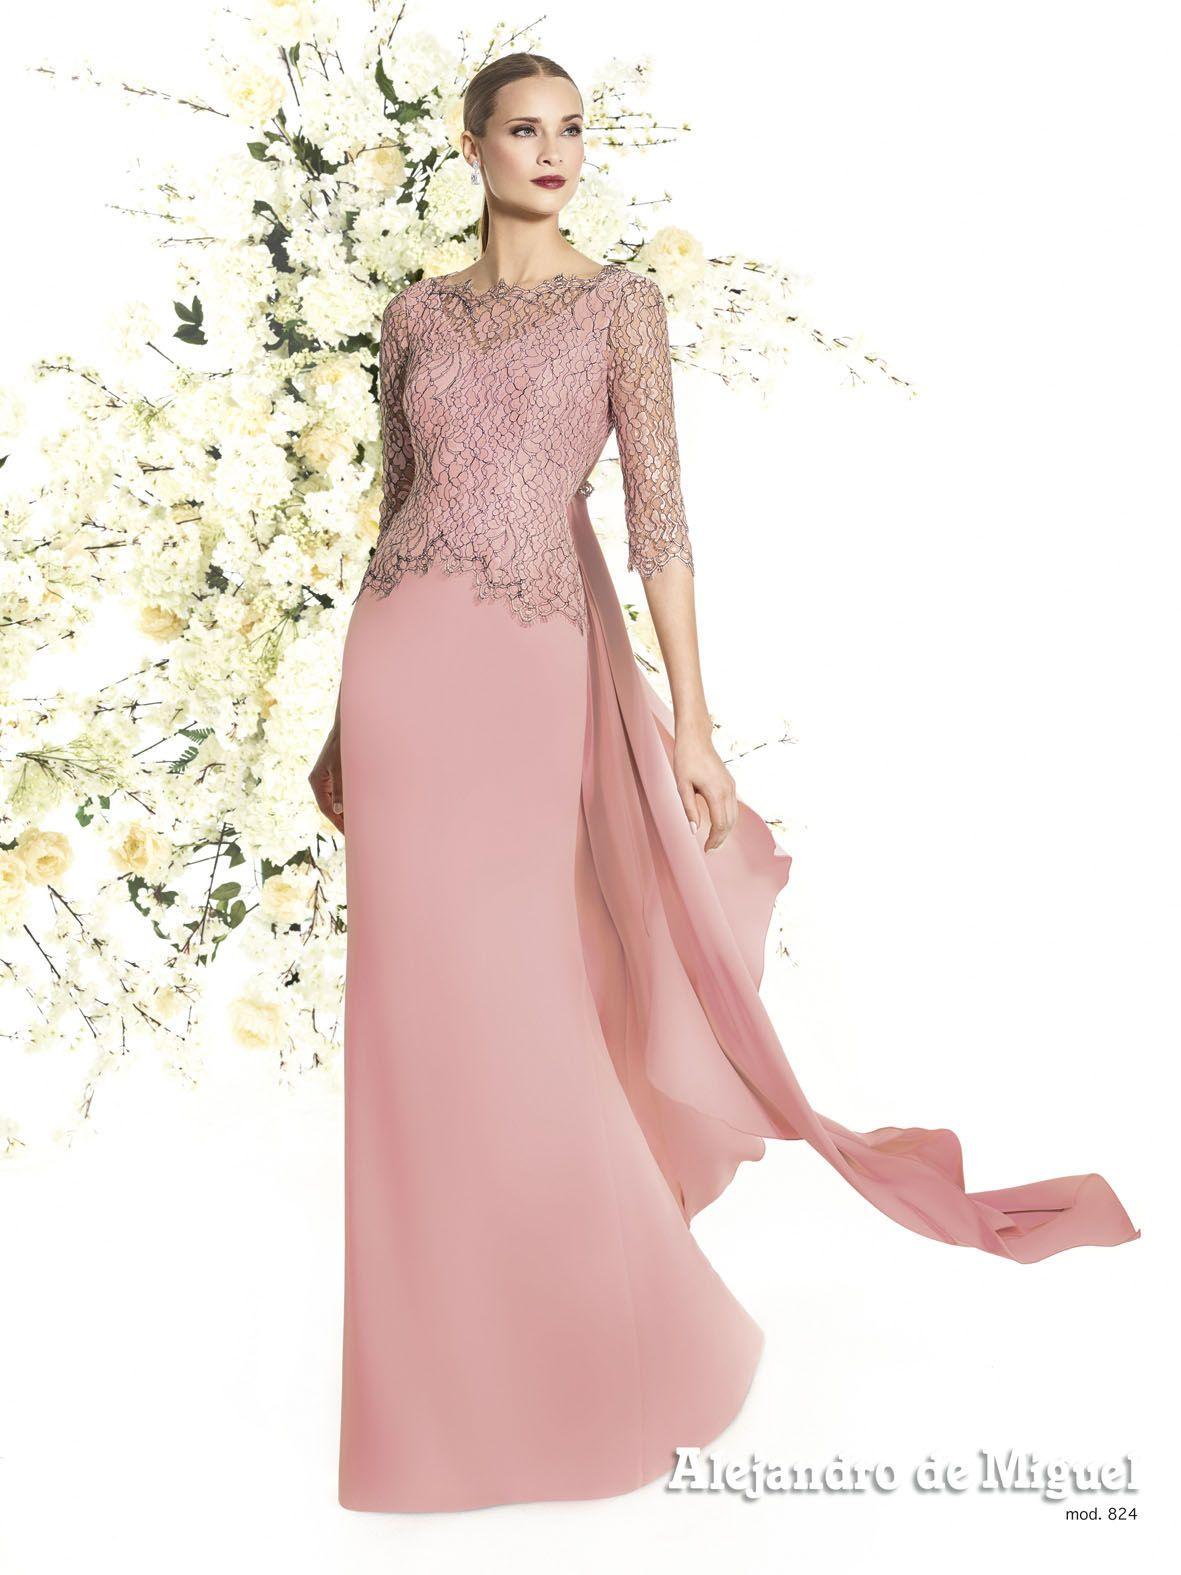 Alejandro de Miguel | Vestido Largo – mod. 824 | boda | Pinterest ...